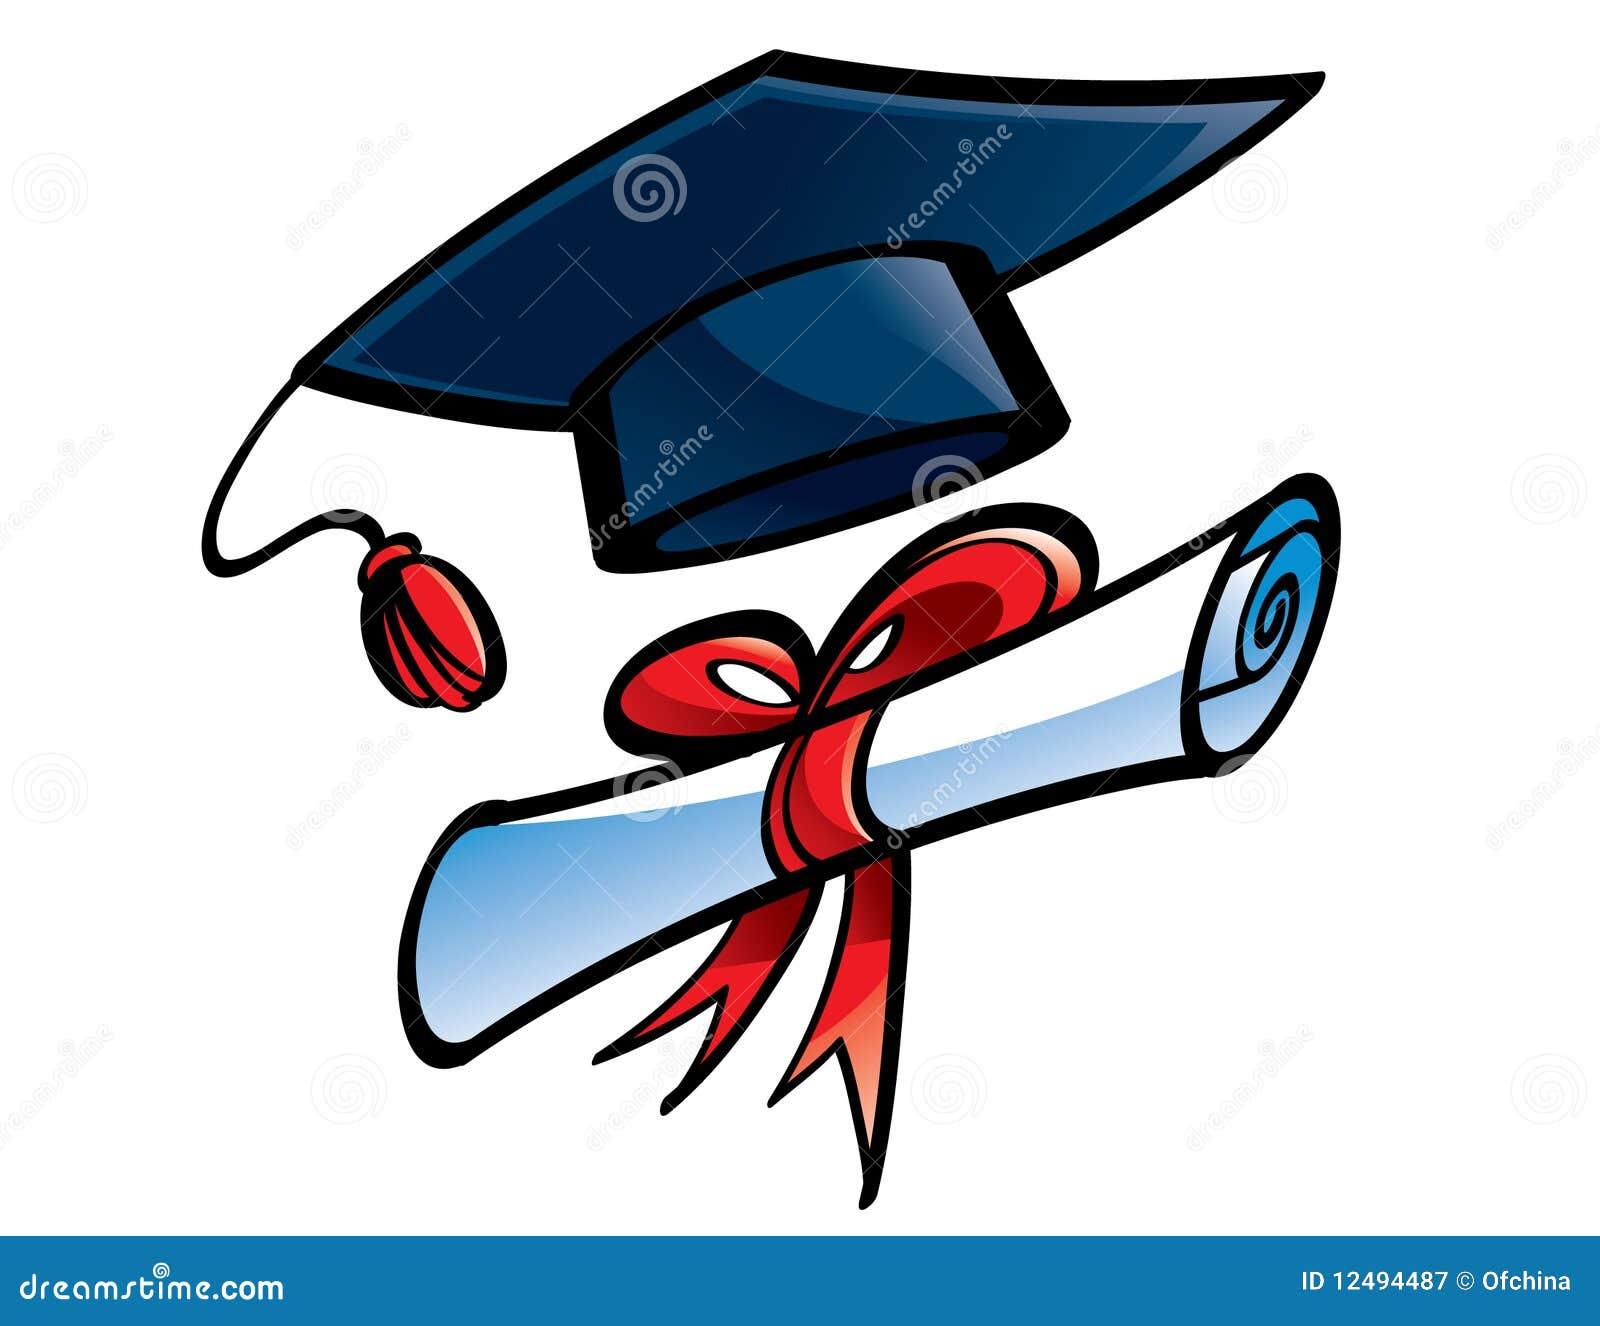 Royalty free stock photography education graduation cap and diploma